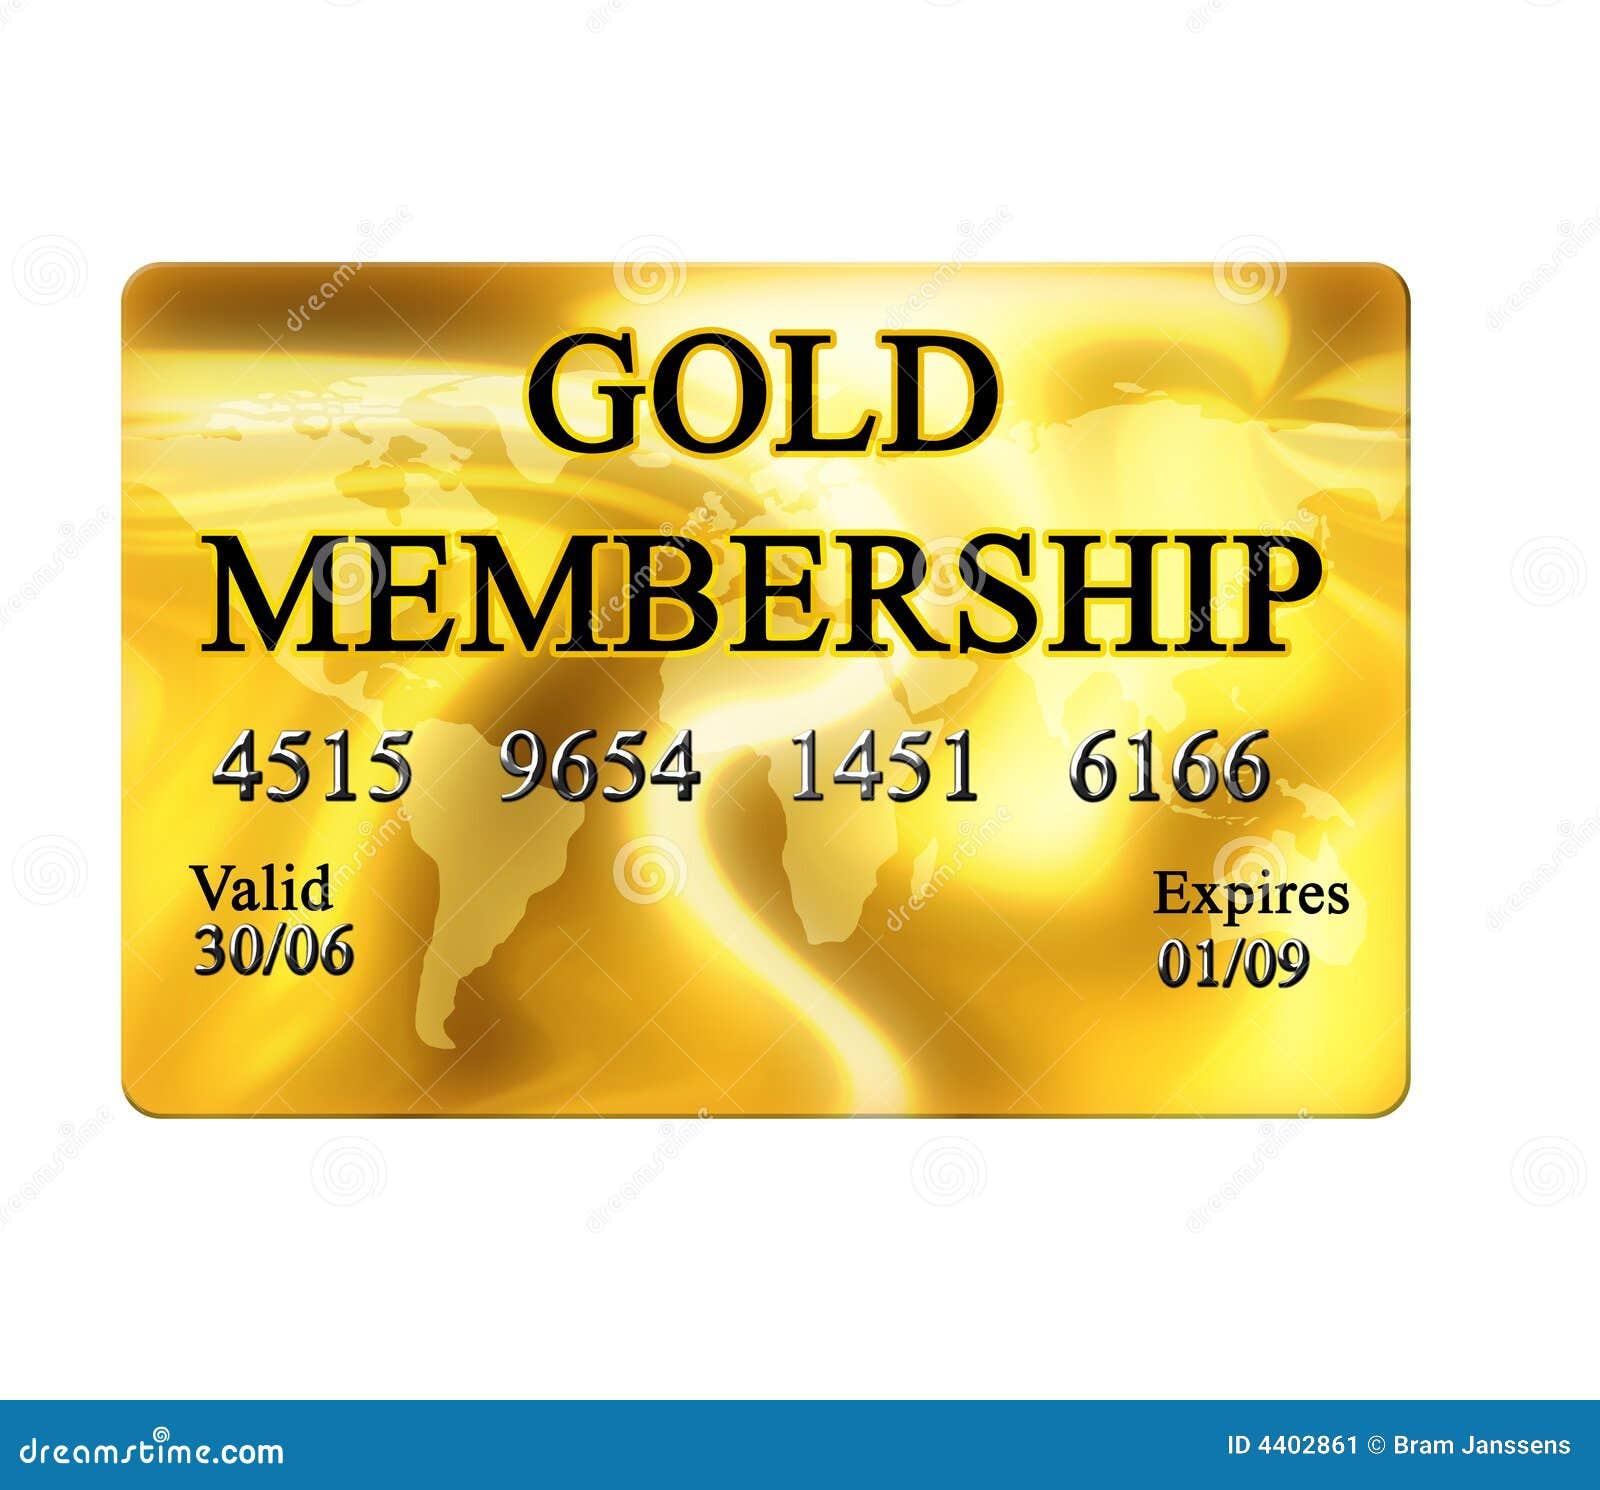 hertz gold club membership card